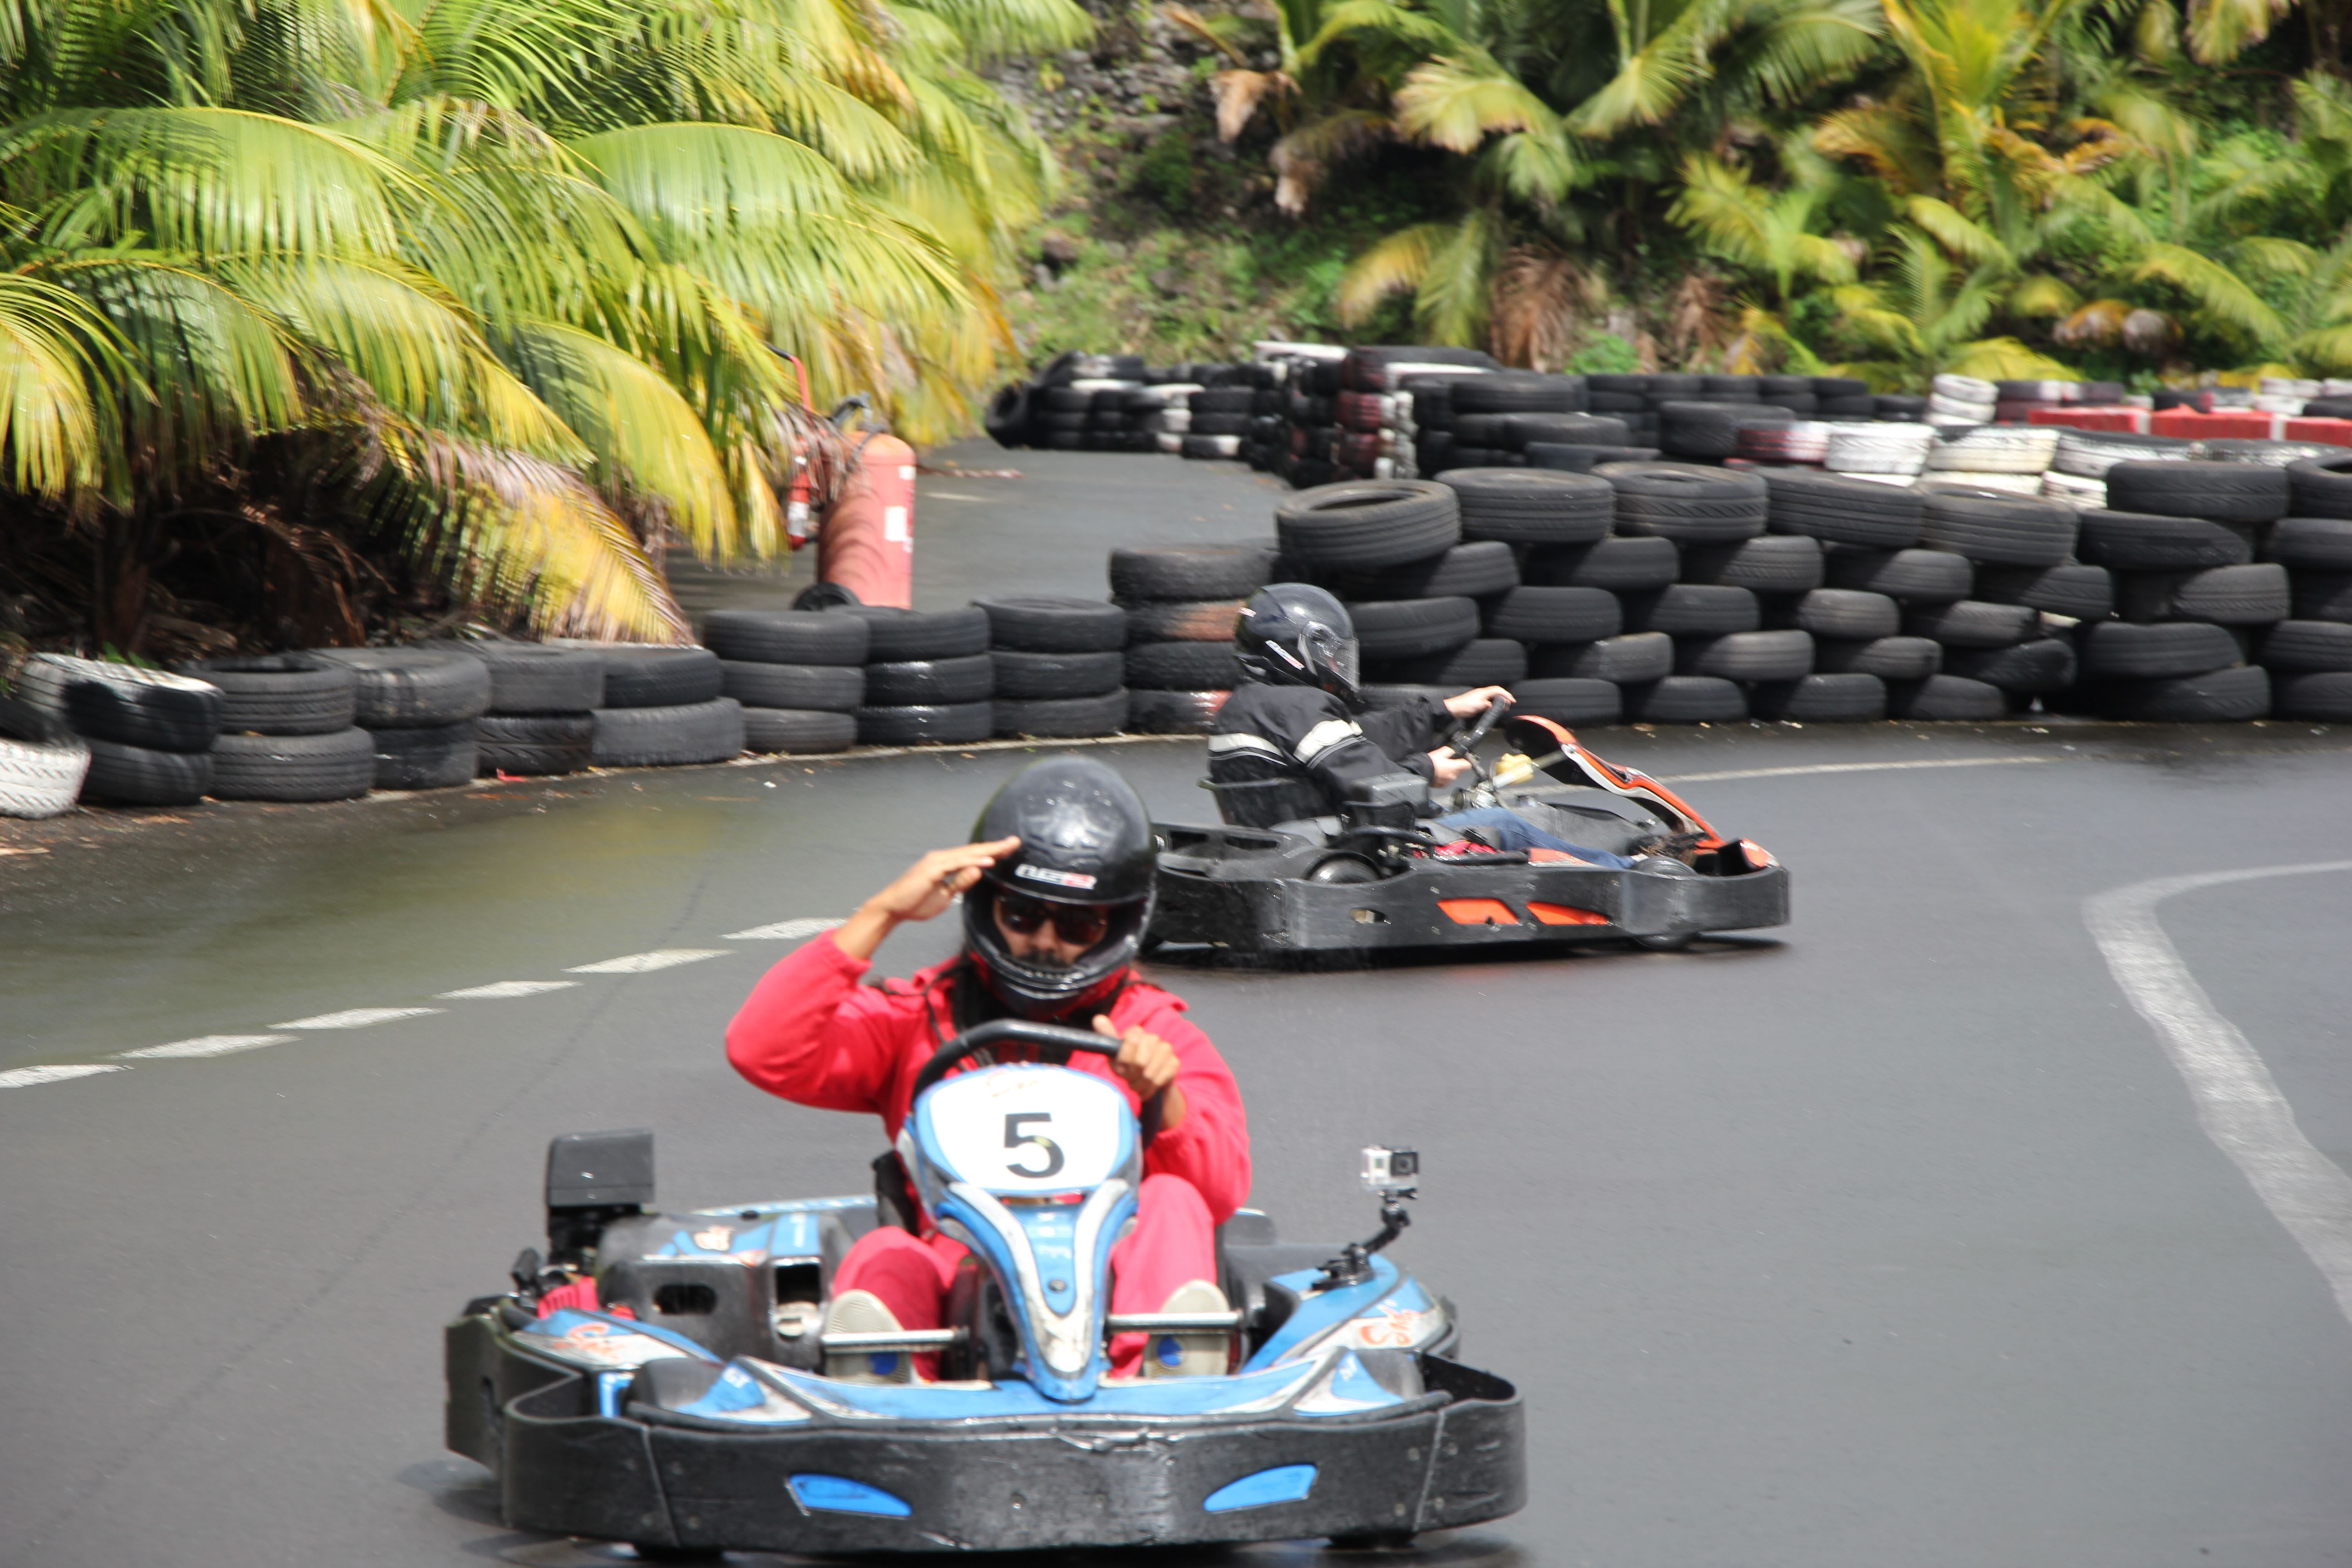 5,4,3,2,1 ... Go ! Challenge karting